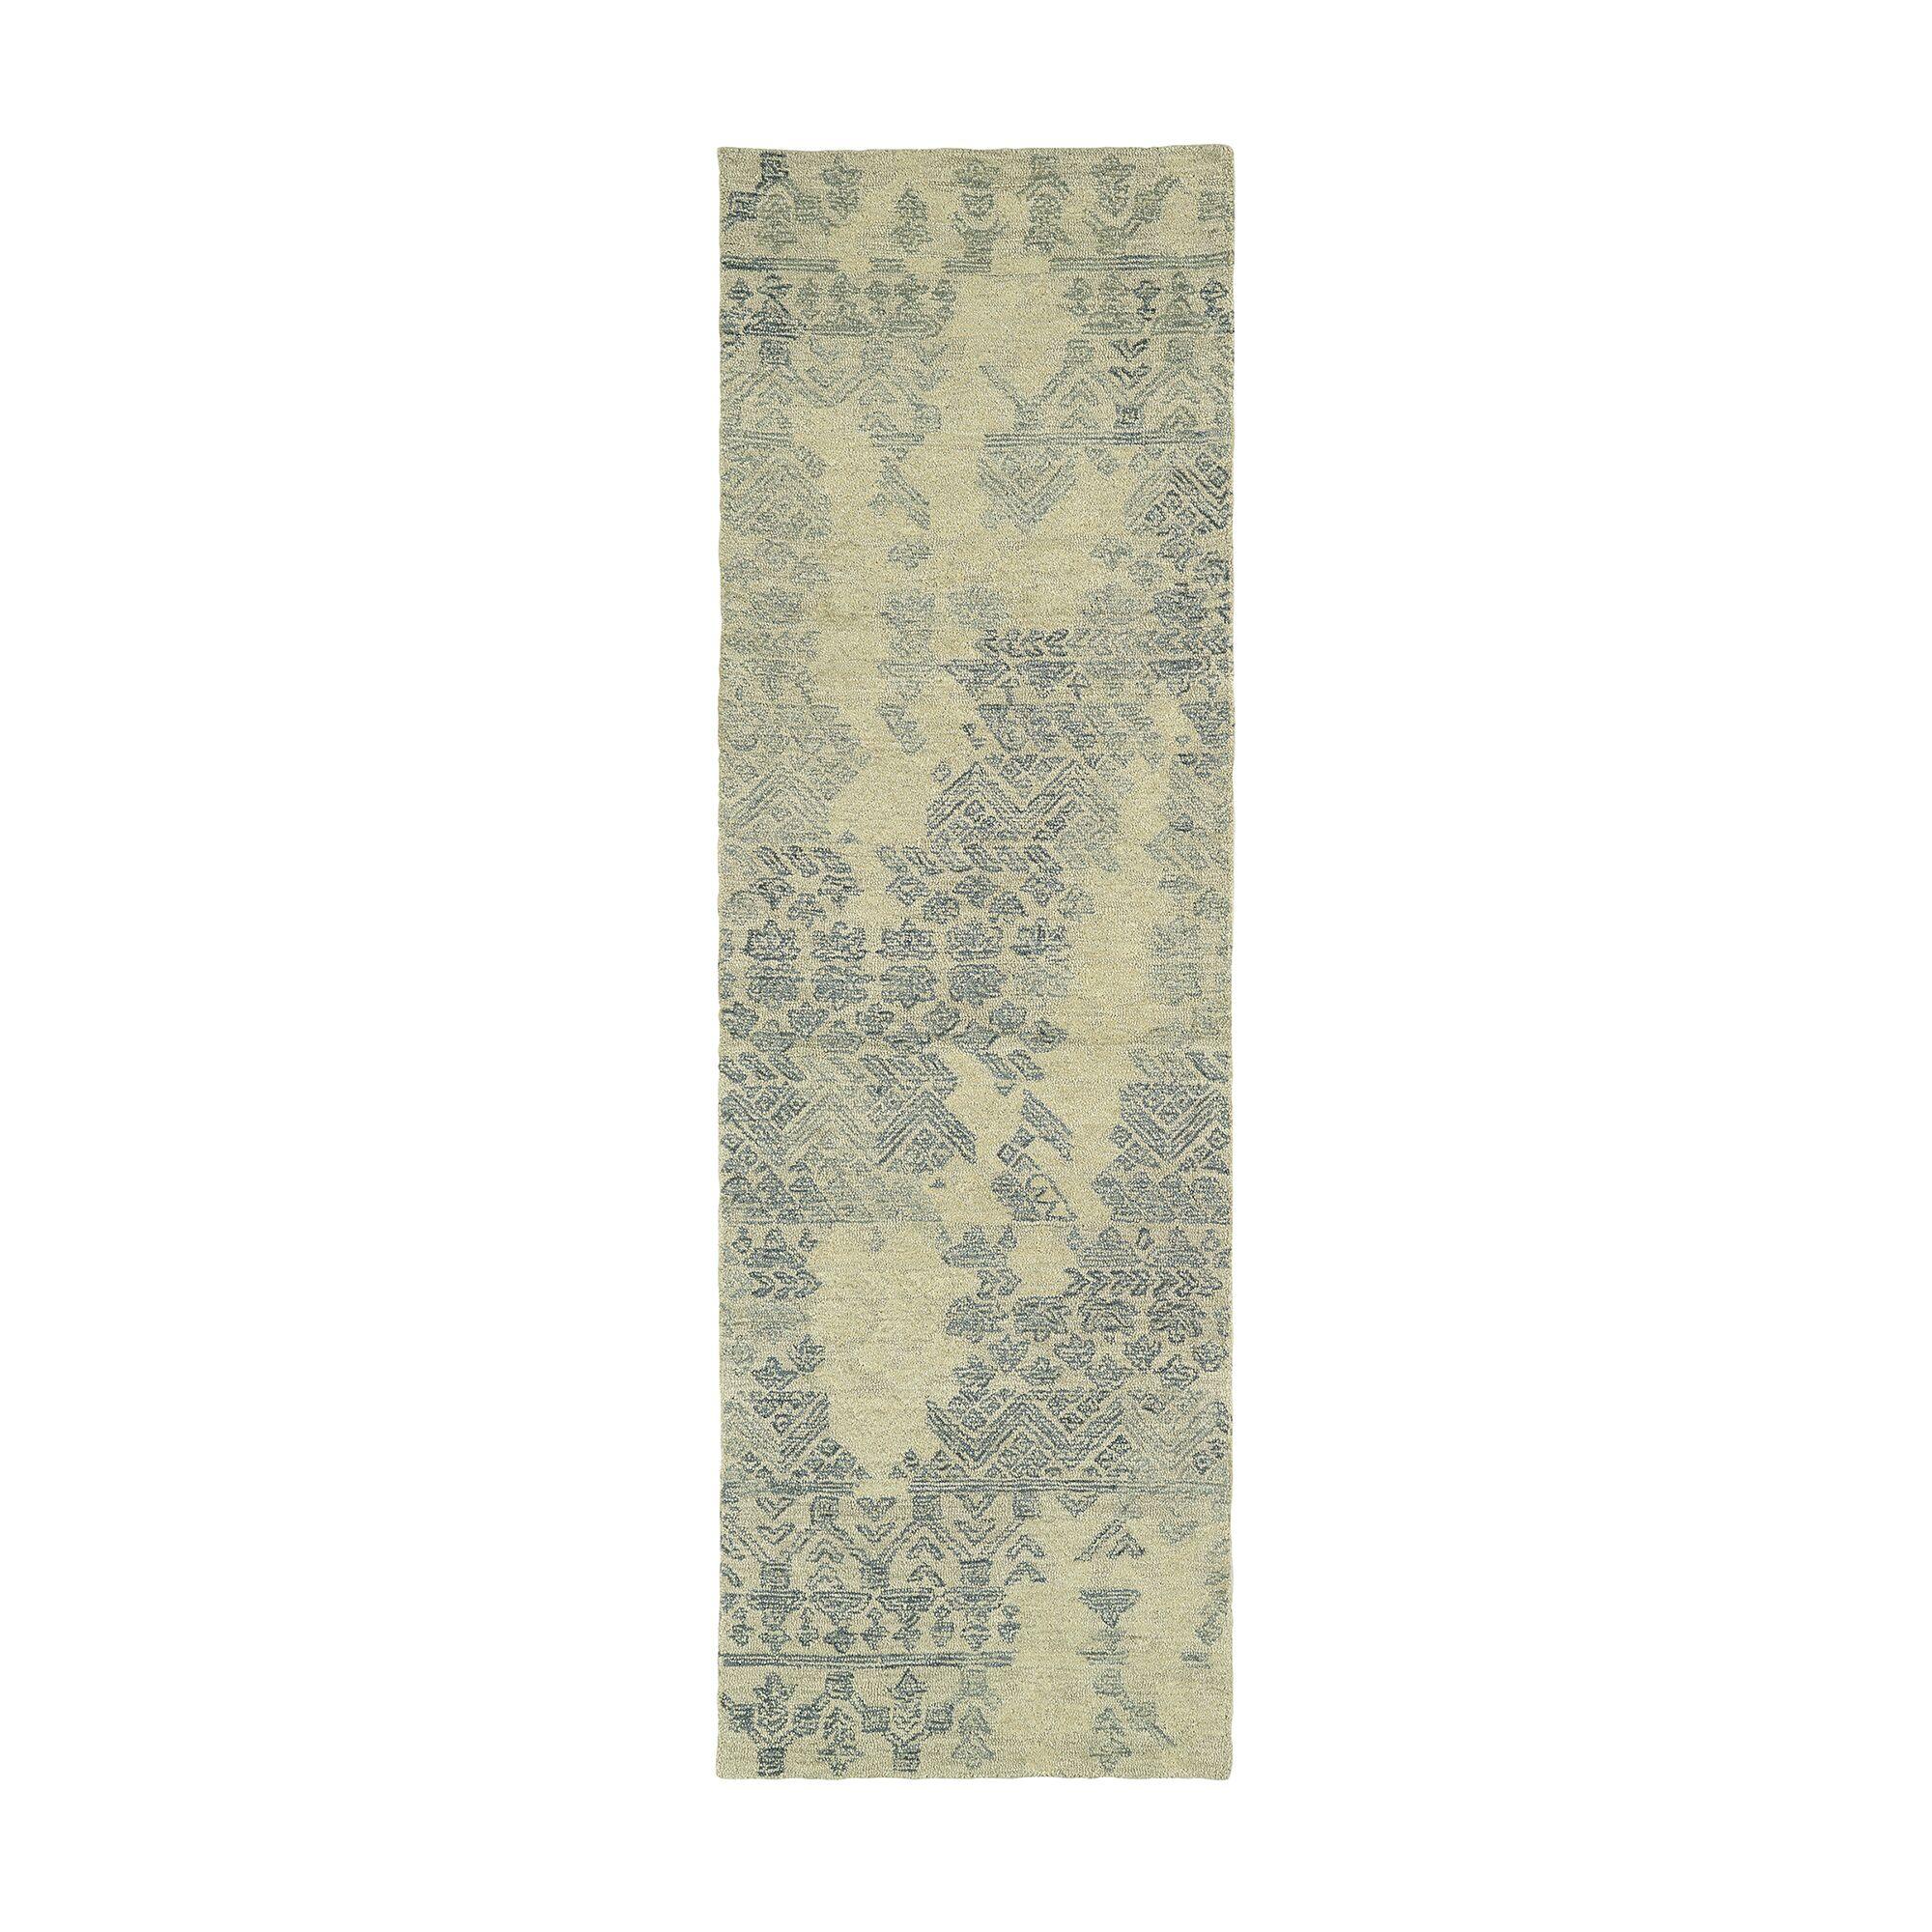 Stockman Hand-Tufted Wool Denim/Beige Area Rug Rug Size: Runner 2'6